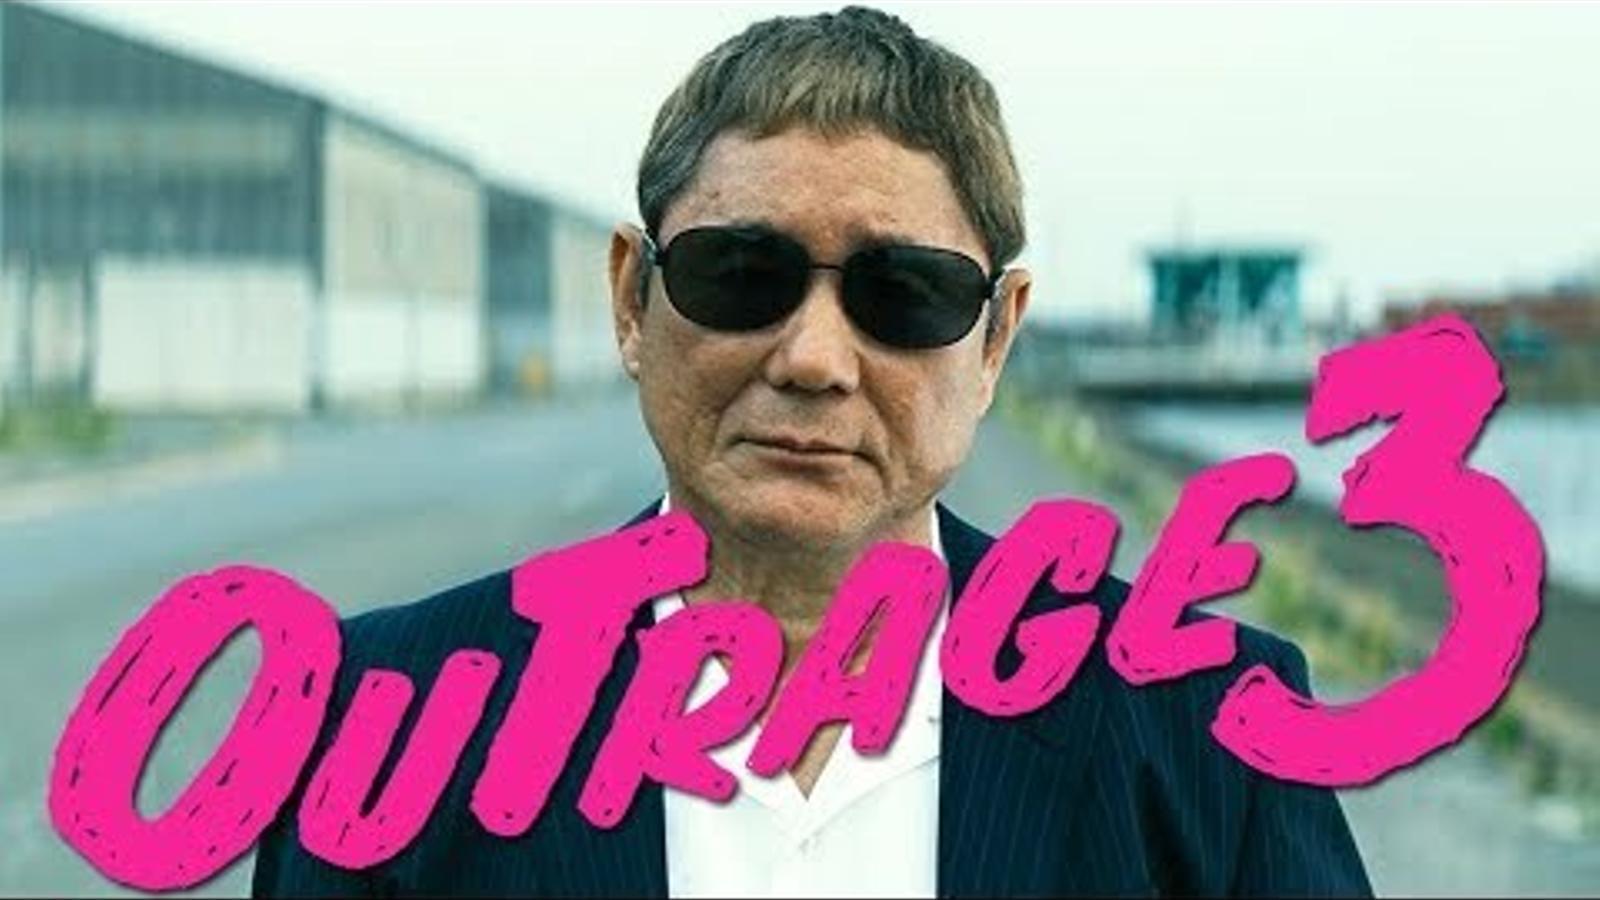 'Outrage 3', tràiler